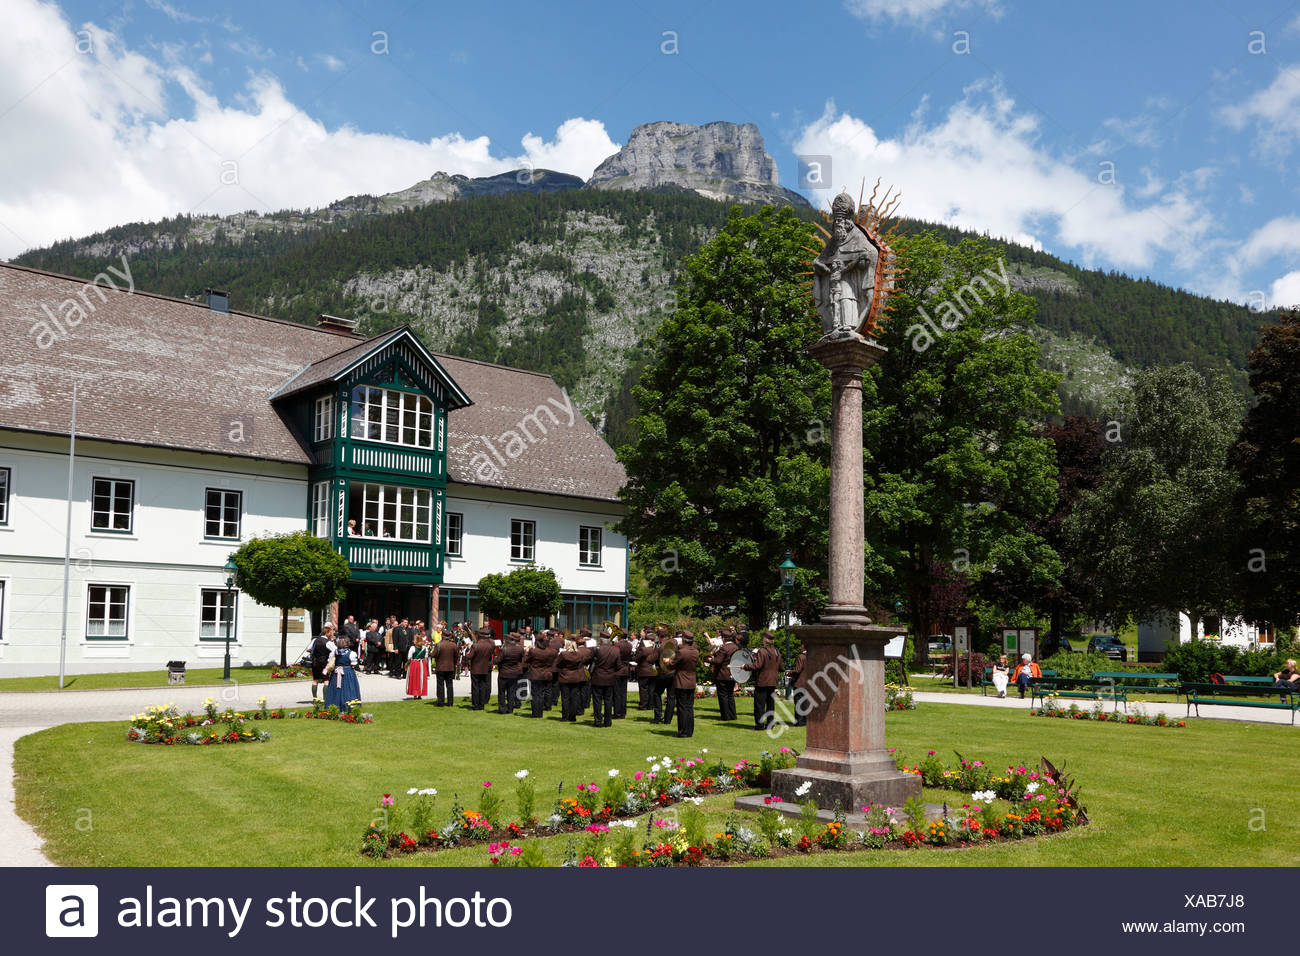 Spa park in Altaussee, Loser mountain, Ausseer Land, Salzkammergut area, Styria, Austria, Europe - Stock Image